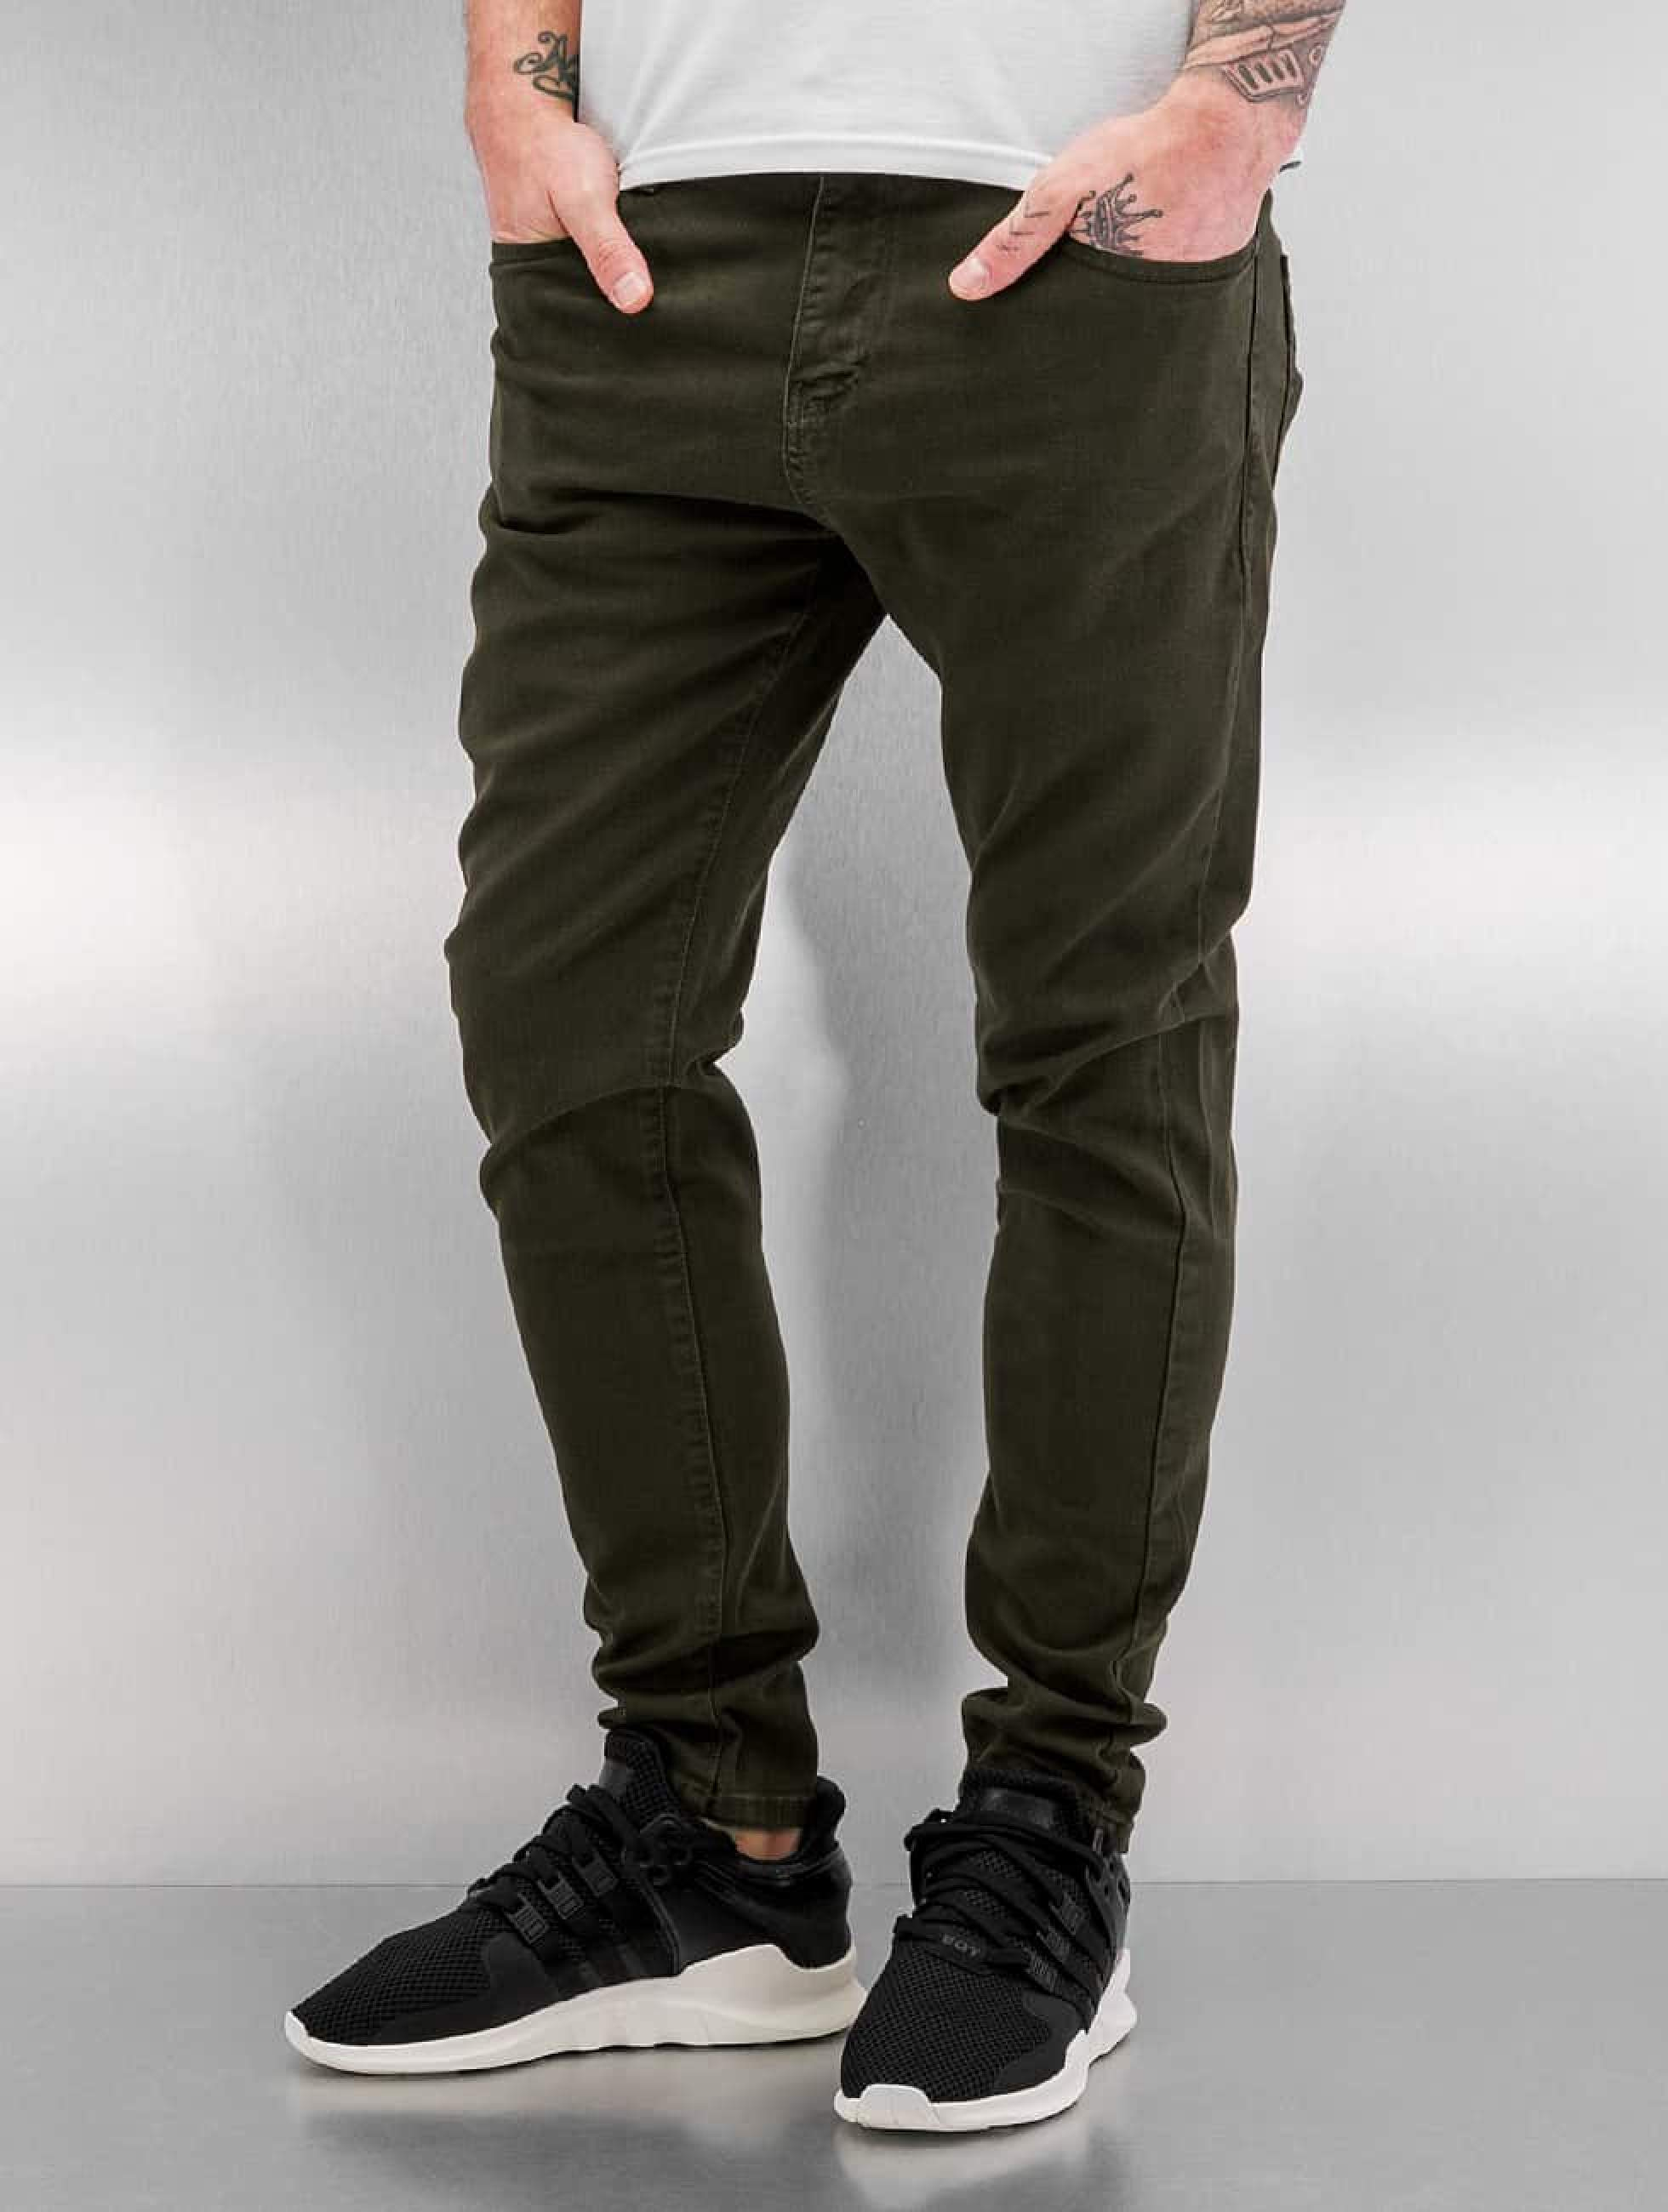 Bangastic / Slim Fit Jeans Burundi in olive W 38